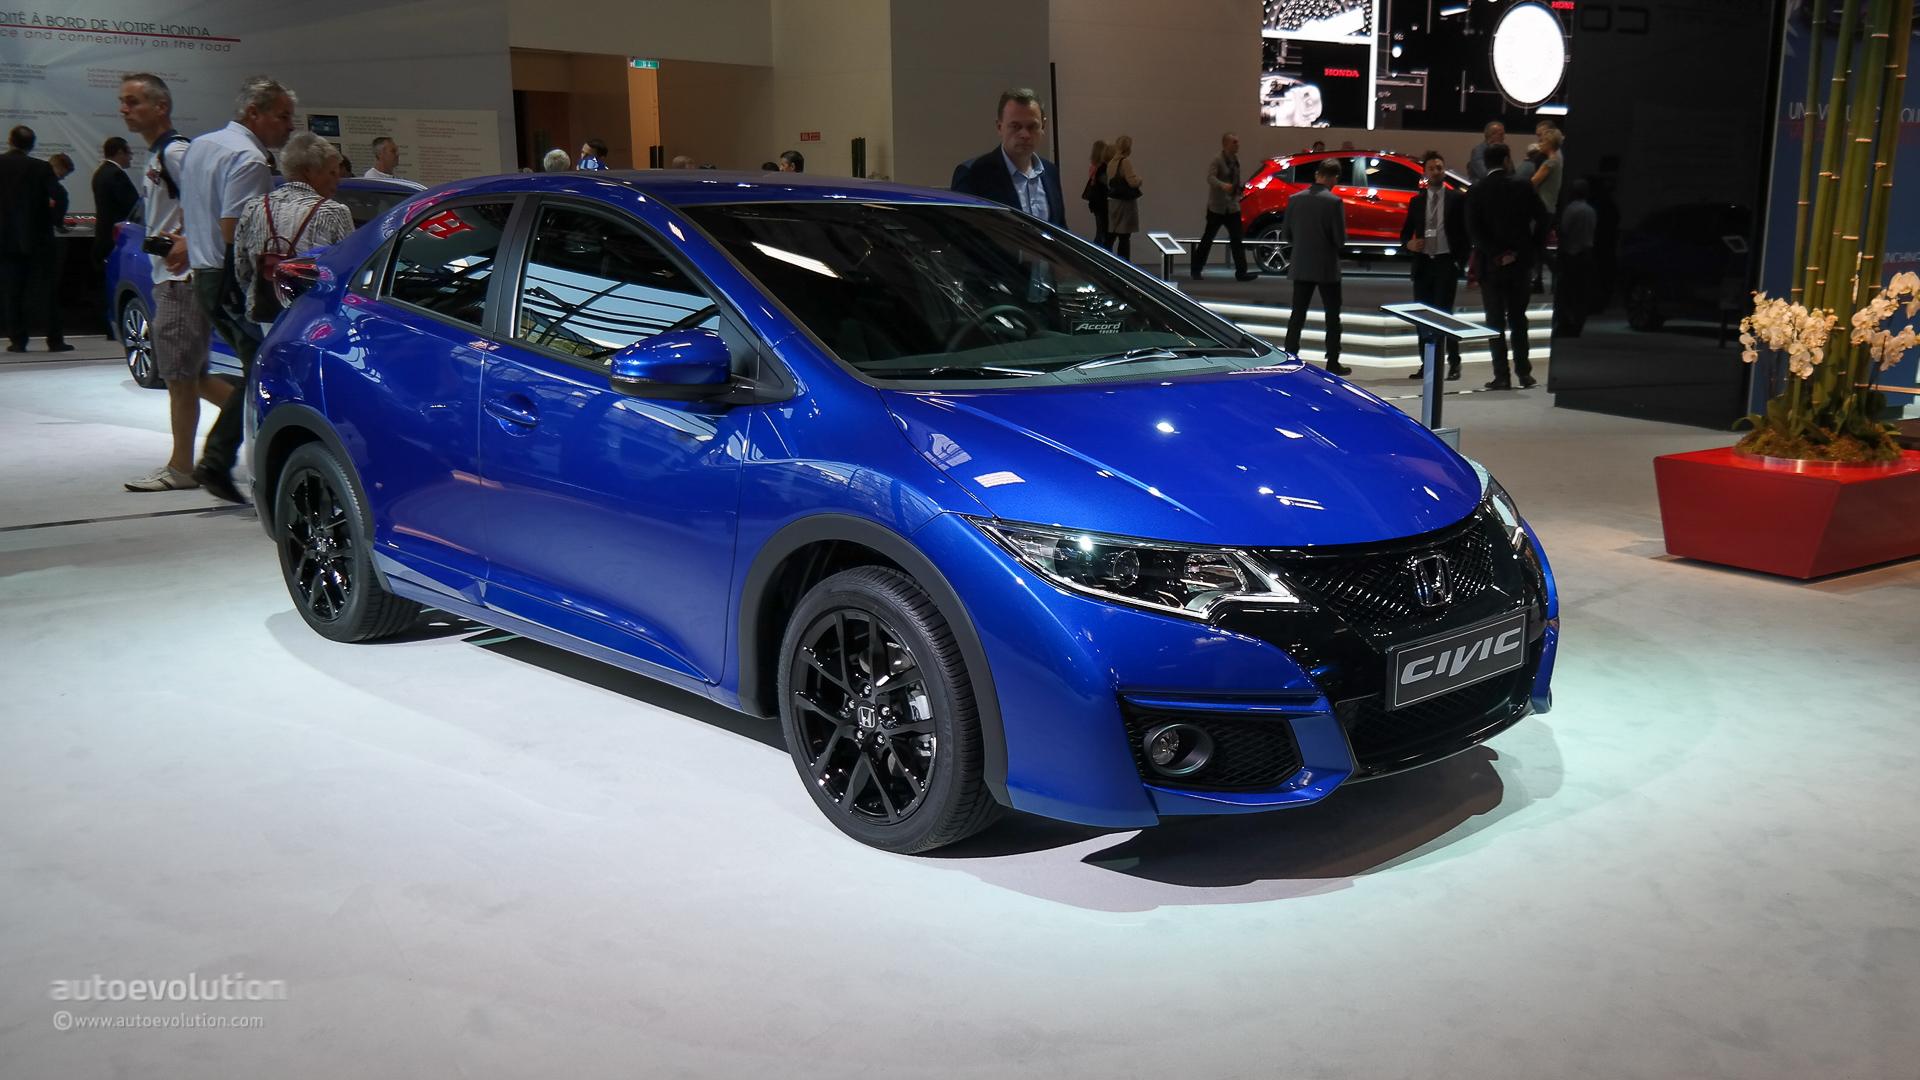 Honda Civic 5-Door Hatchback Coming to the US in 2016 - autoevolution